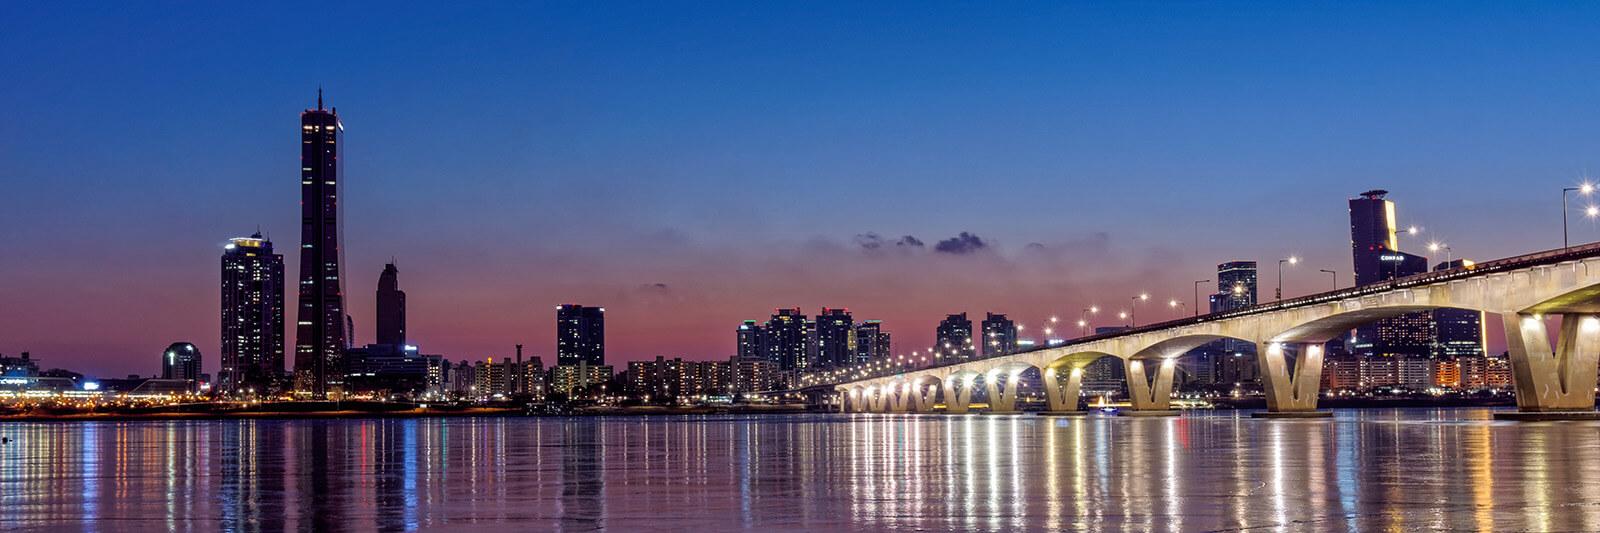 Seoul, South Korea skyline just after sunset